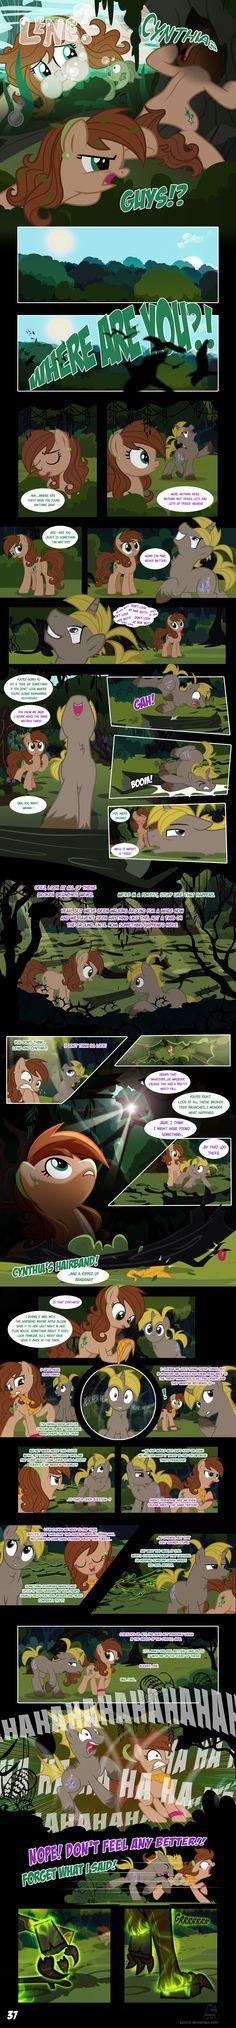 My Little Sterelis chap 2 pg 37 by JaDeDJynX.deviantart.com on @DeviantArt